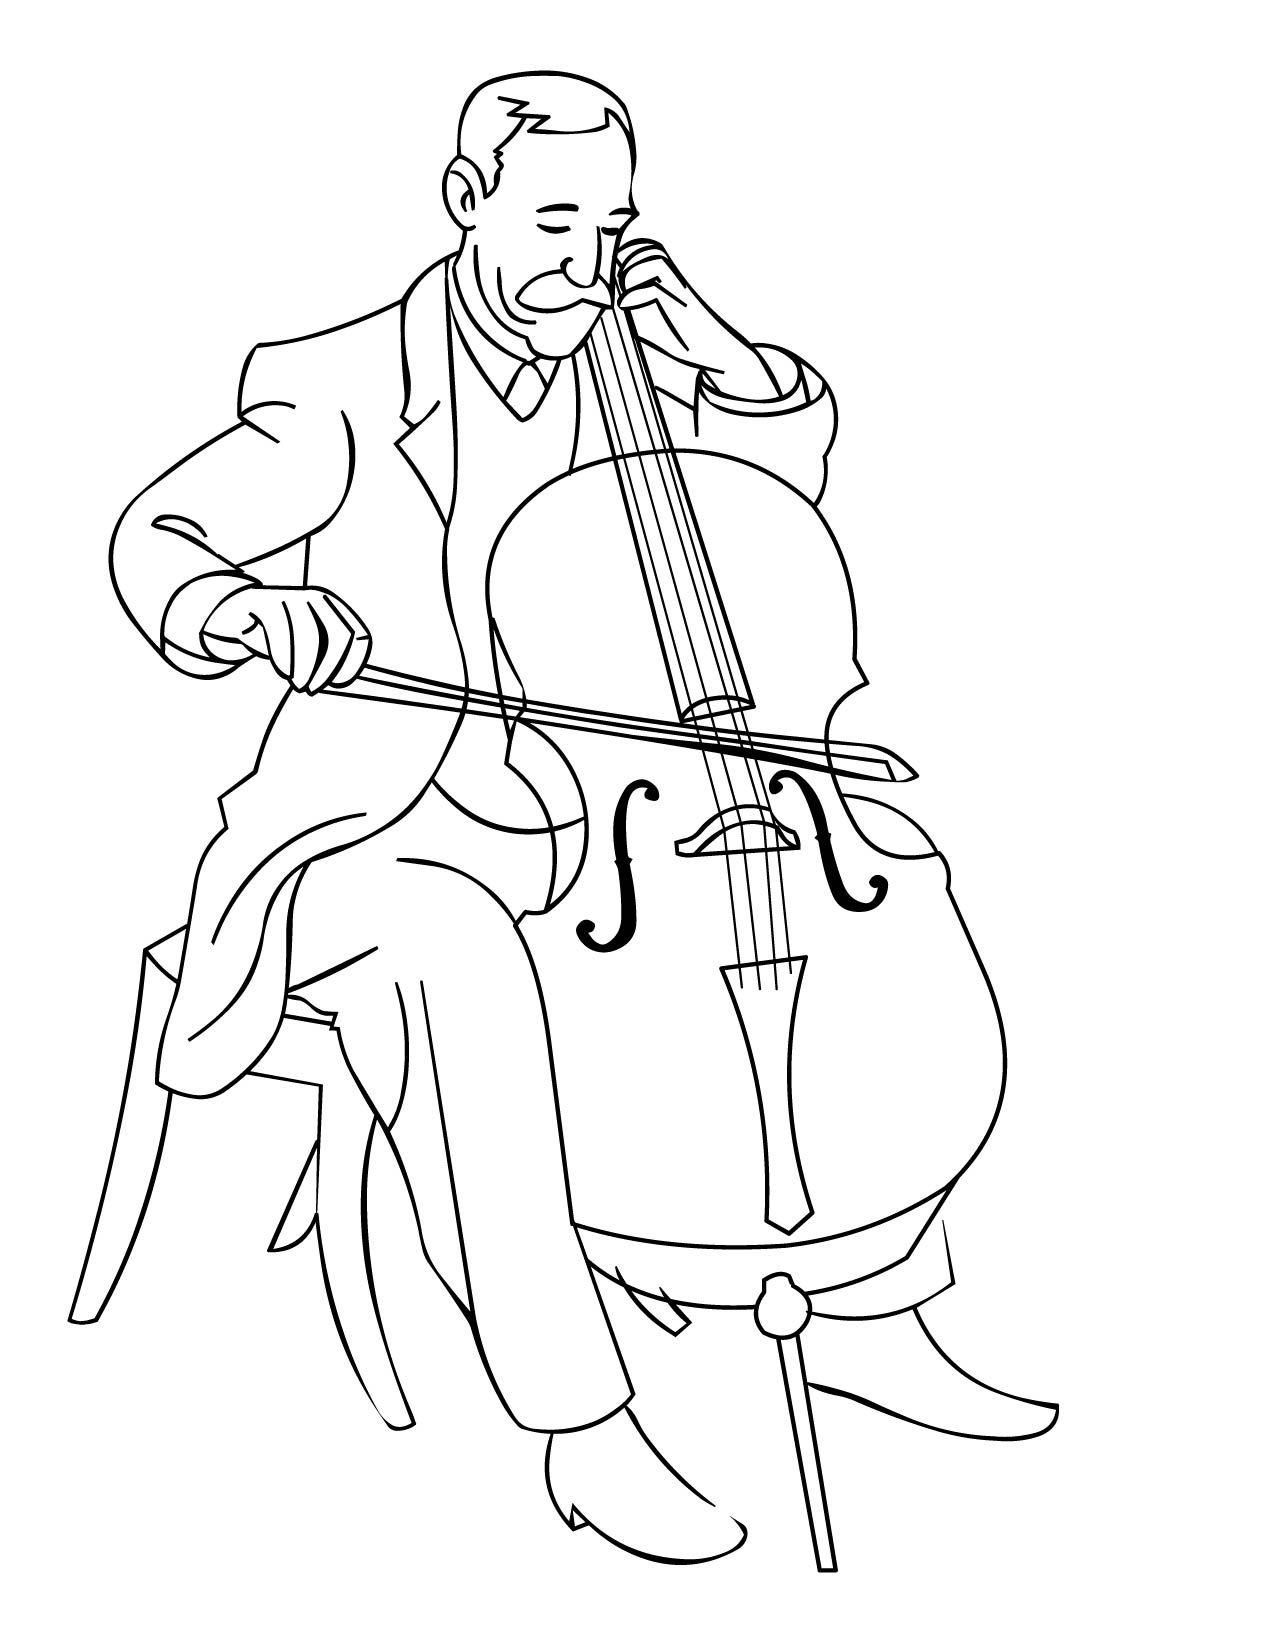 Cello Clipart Coloring Page Cello Coloring Page